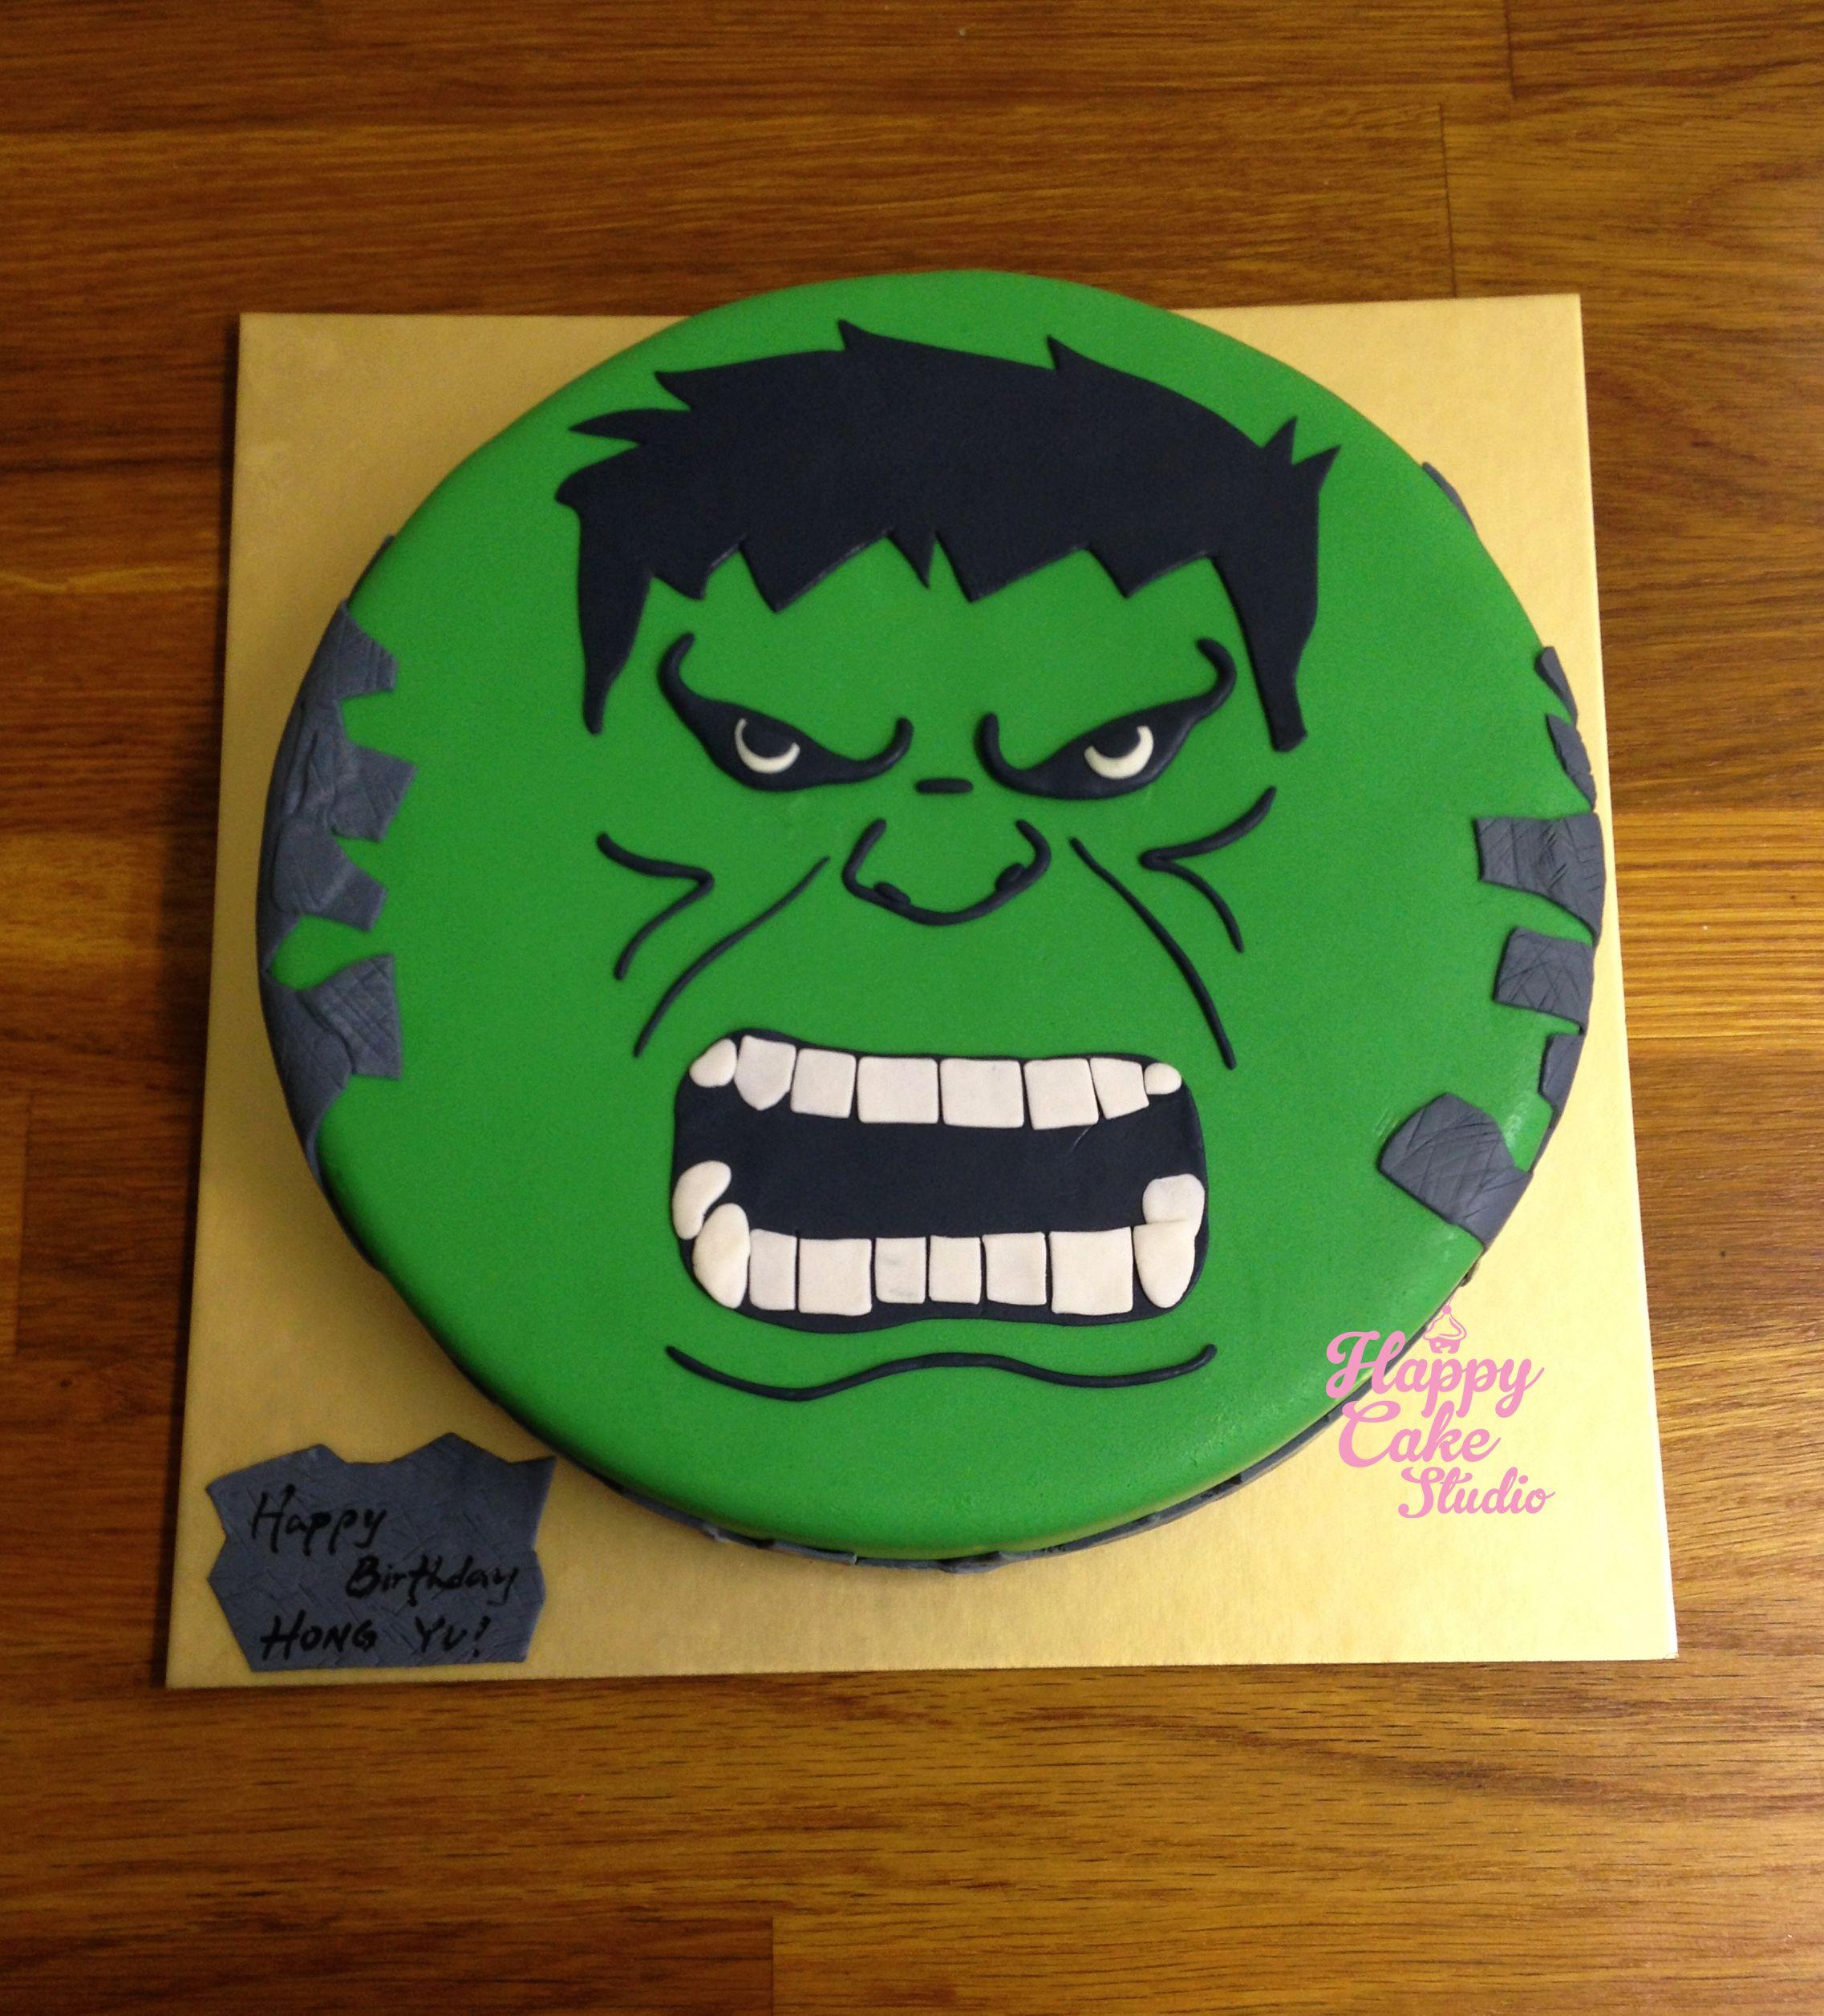 hulk cake Google Search Hulk Pinterest Hulk cakes and Cake